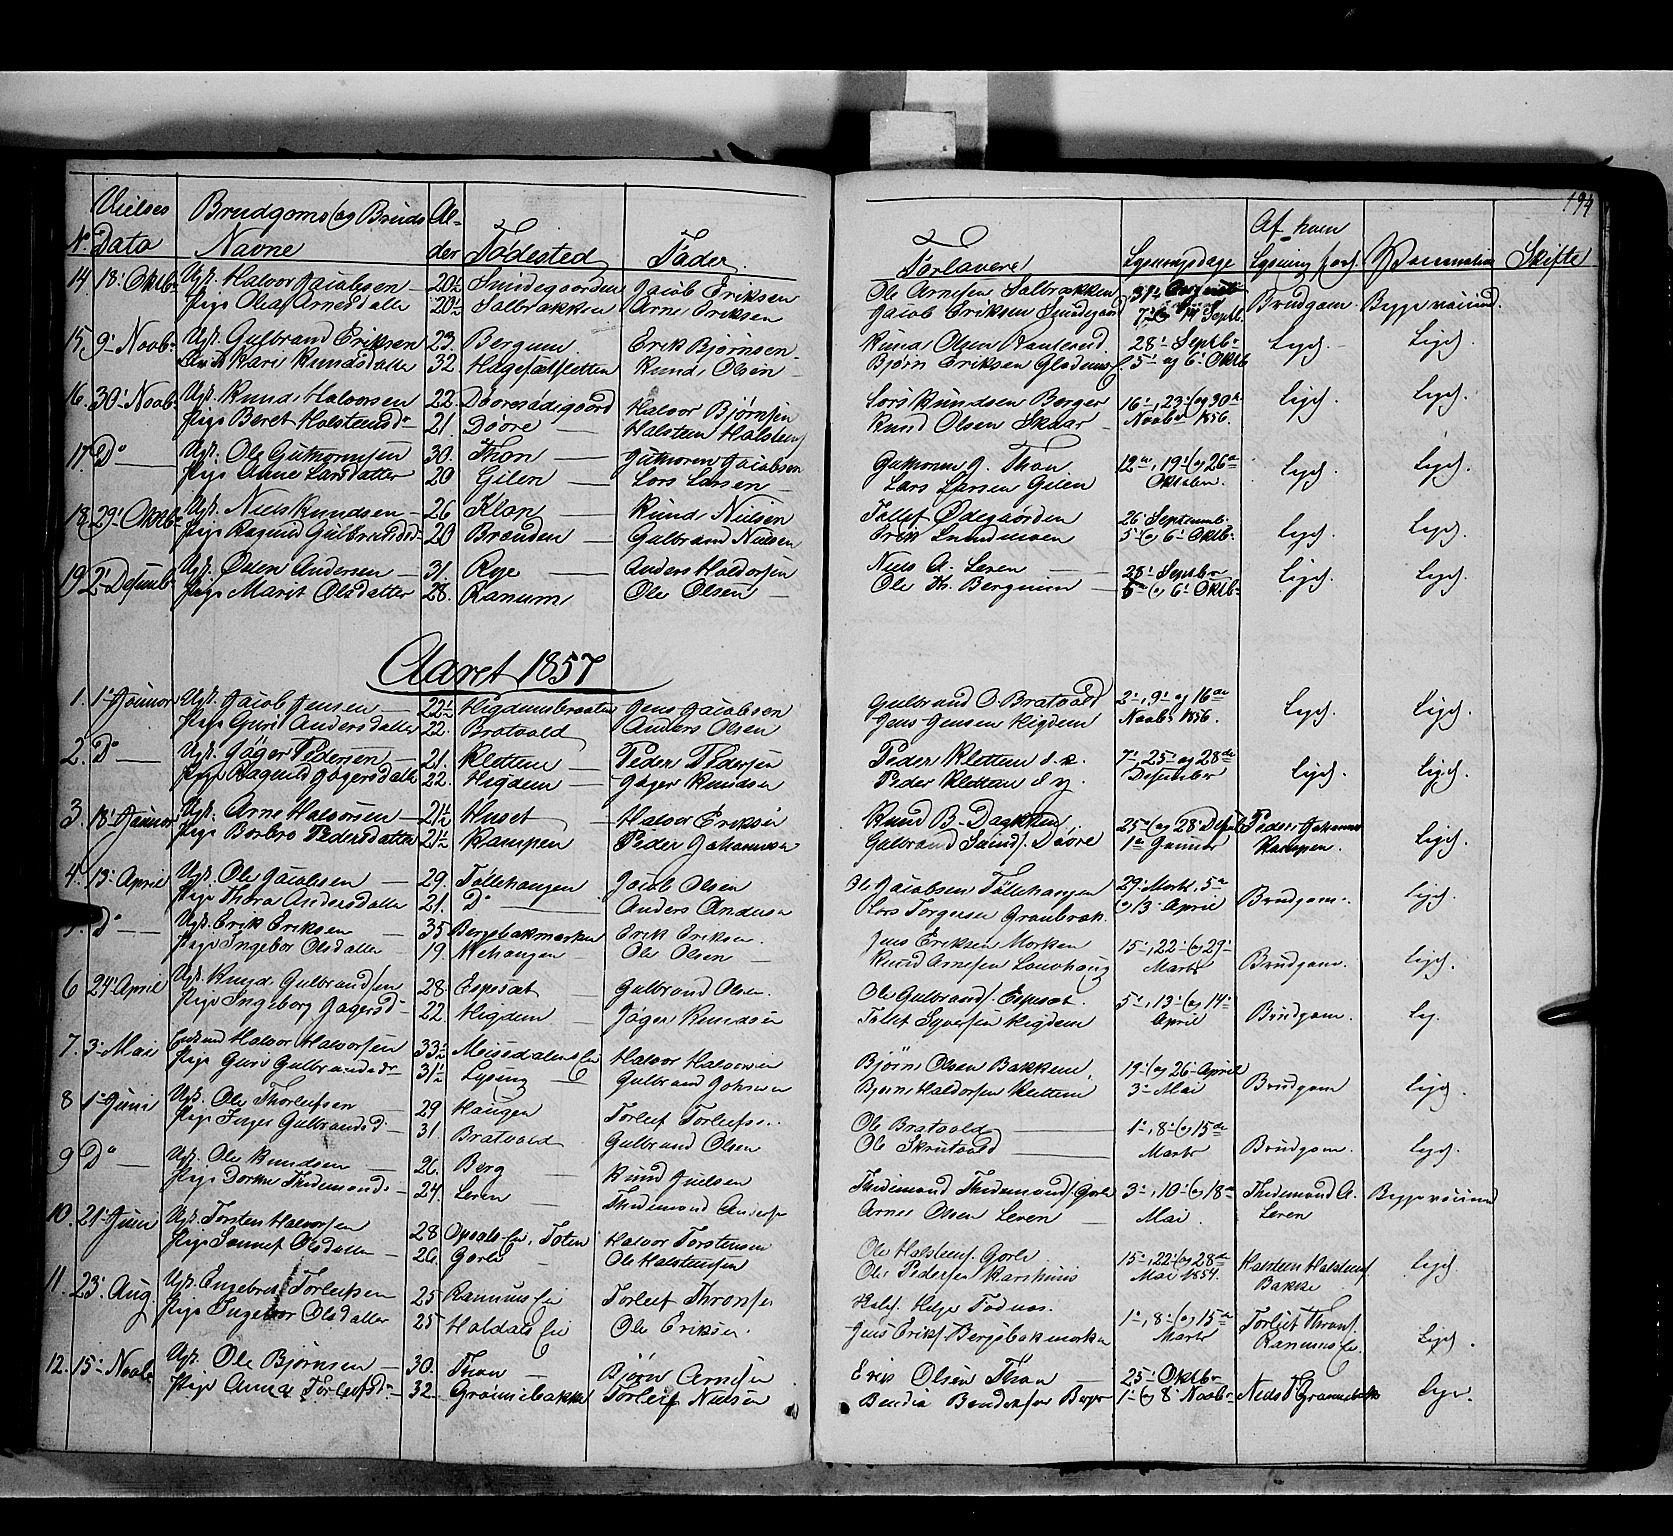 SAH, Nord-Aurdal prestekontor, Ministerialbok nr. 7, 1842-1863, s. 194